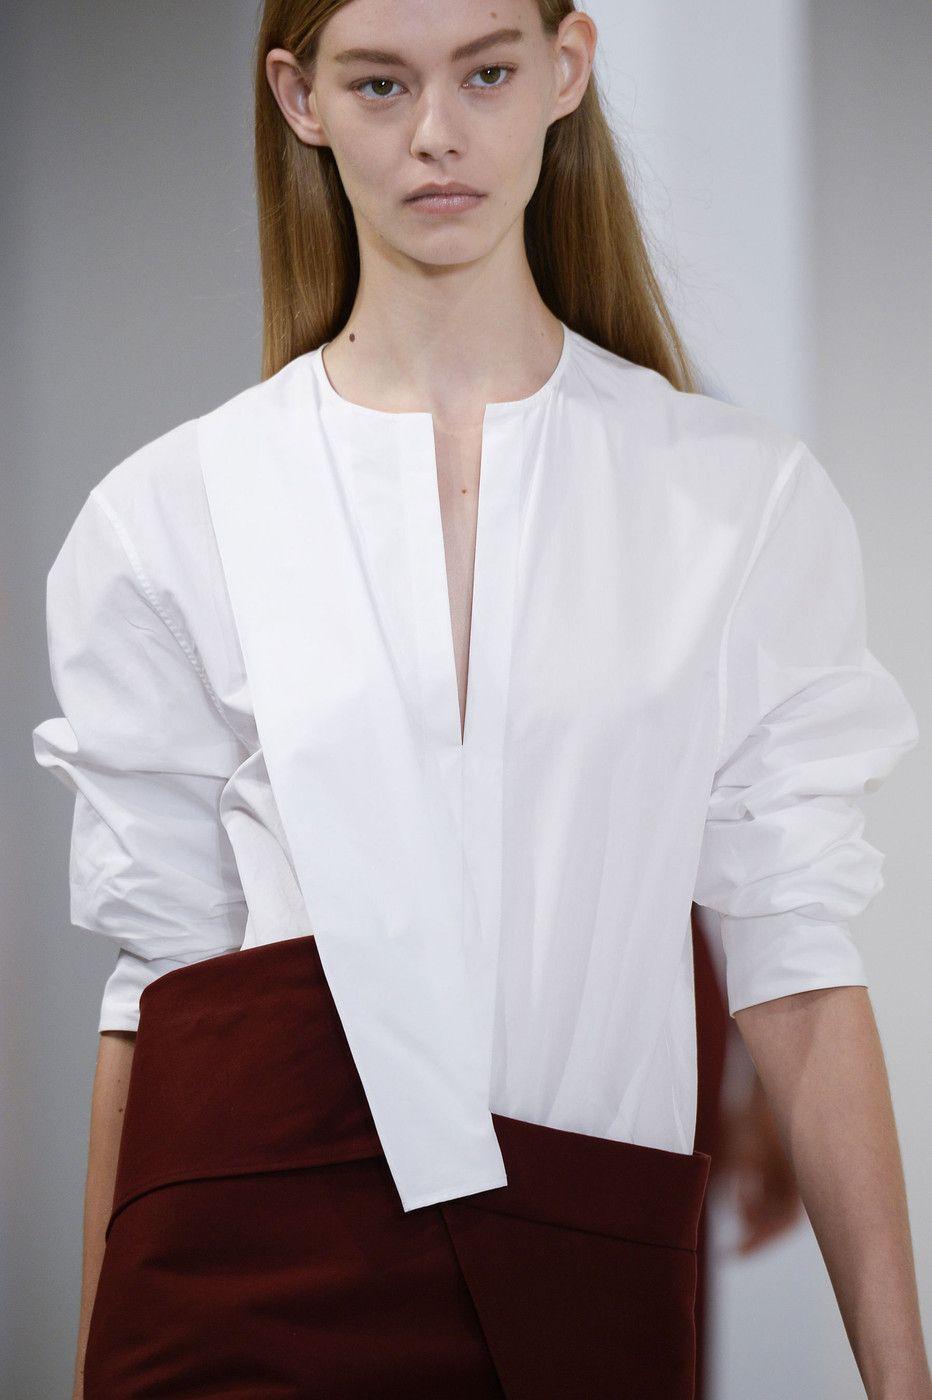 jil sander at milan fashion week spring 2015 the architecture of fashion pinterest milan. Black Bedroom Furniture Sets. Home Design Ideas